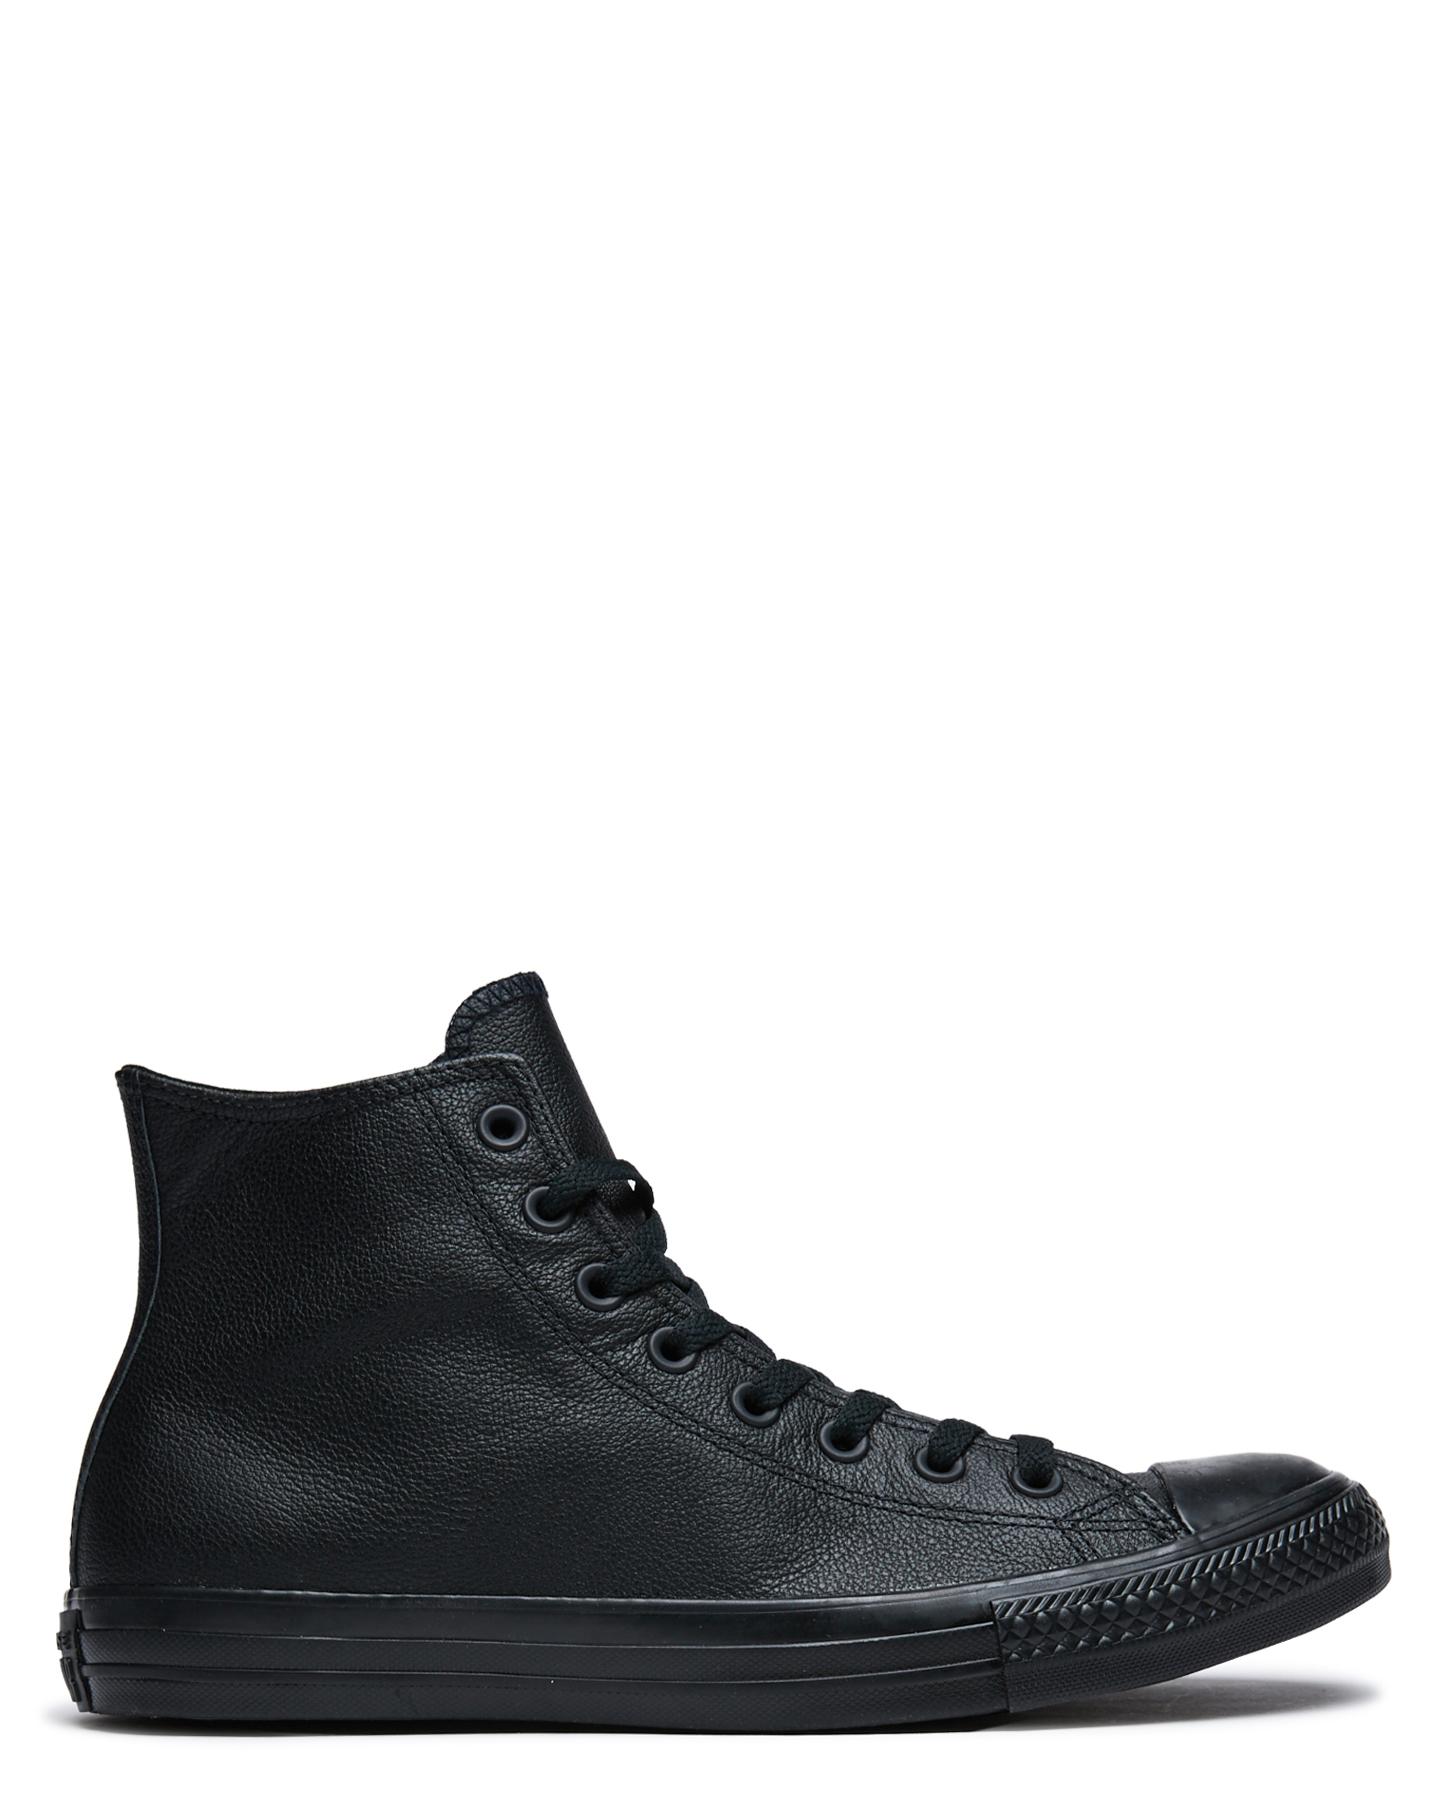 Womens Taylor Hi Leather Shoe Chuck All Star Top E9IY2WDHe